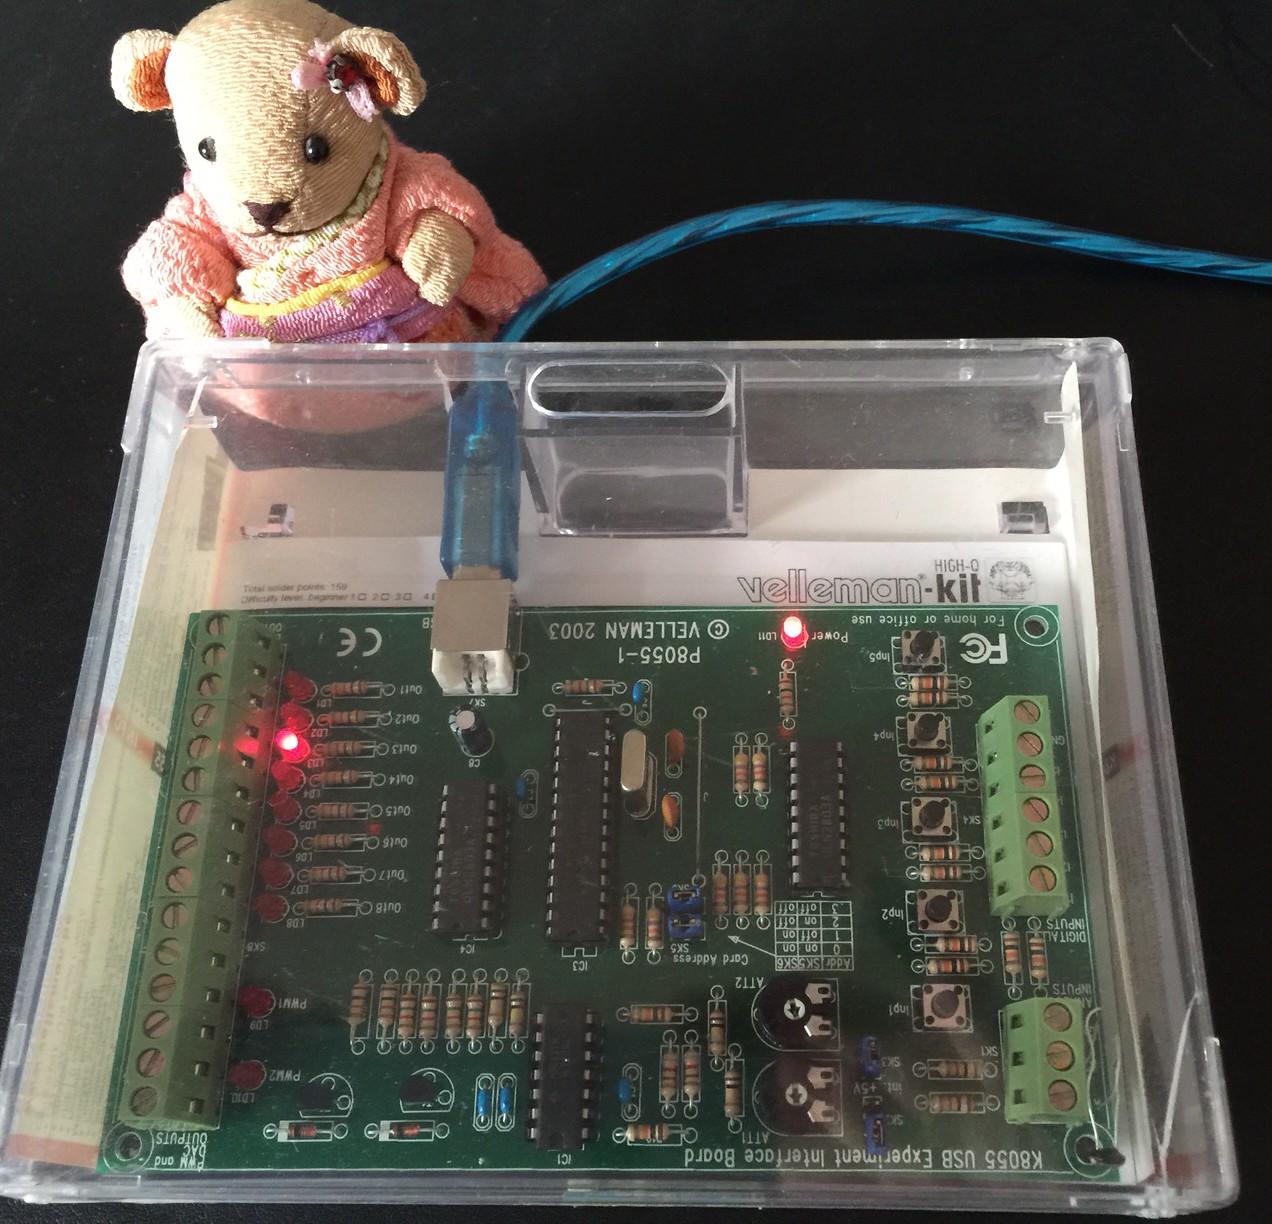 K8055 für den Raspberry Pi via Kali